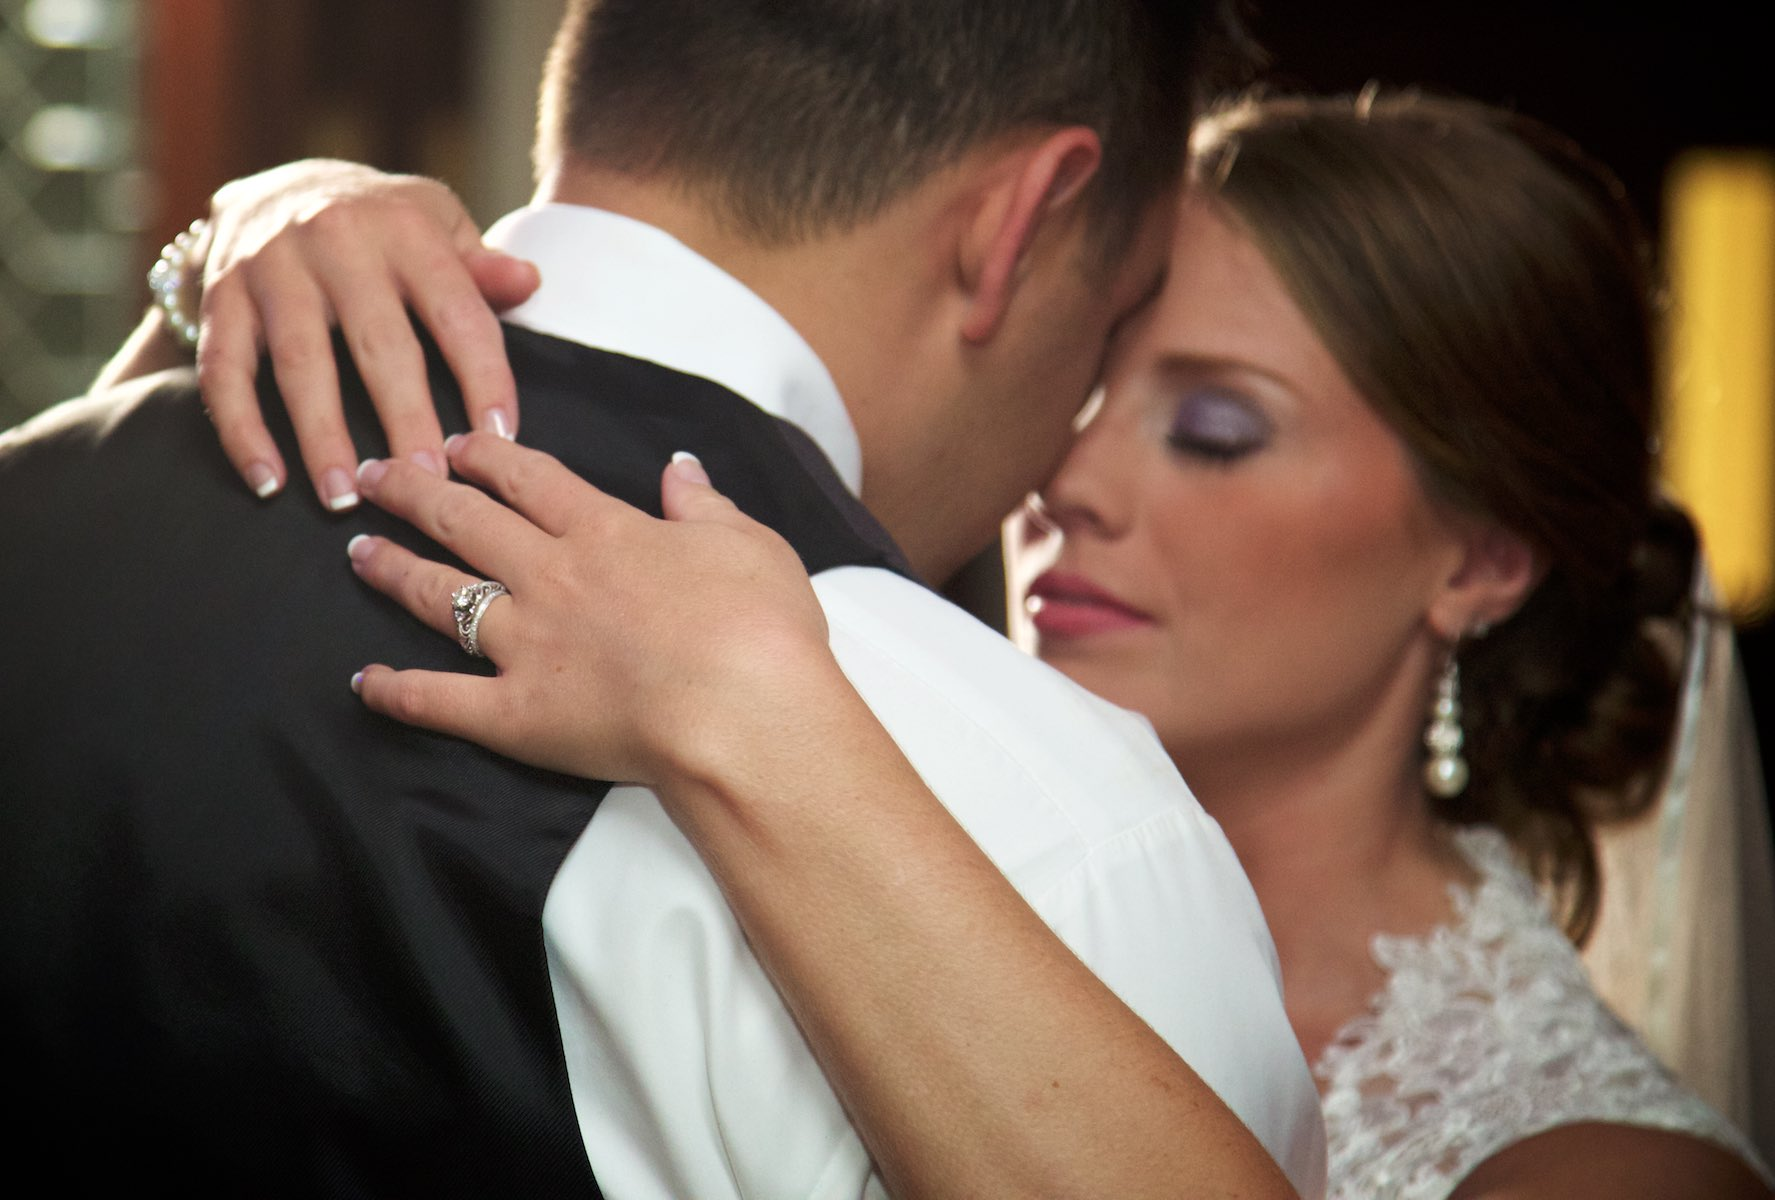 First dance, Amanda & Nick's wedding reception at the Jacksonville Illinois Country Club. Wedding photography by Steve & Tiffany Warmowski.